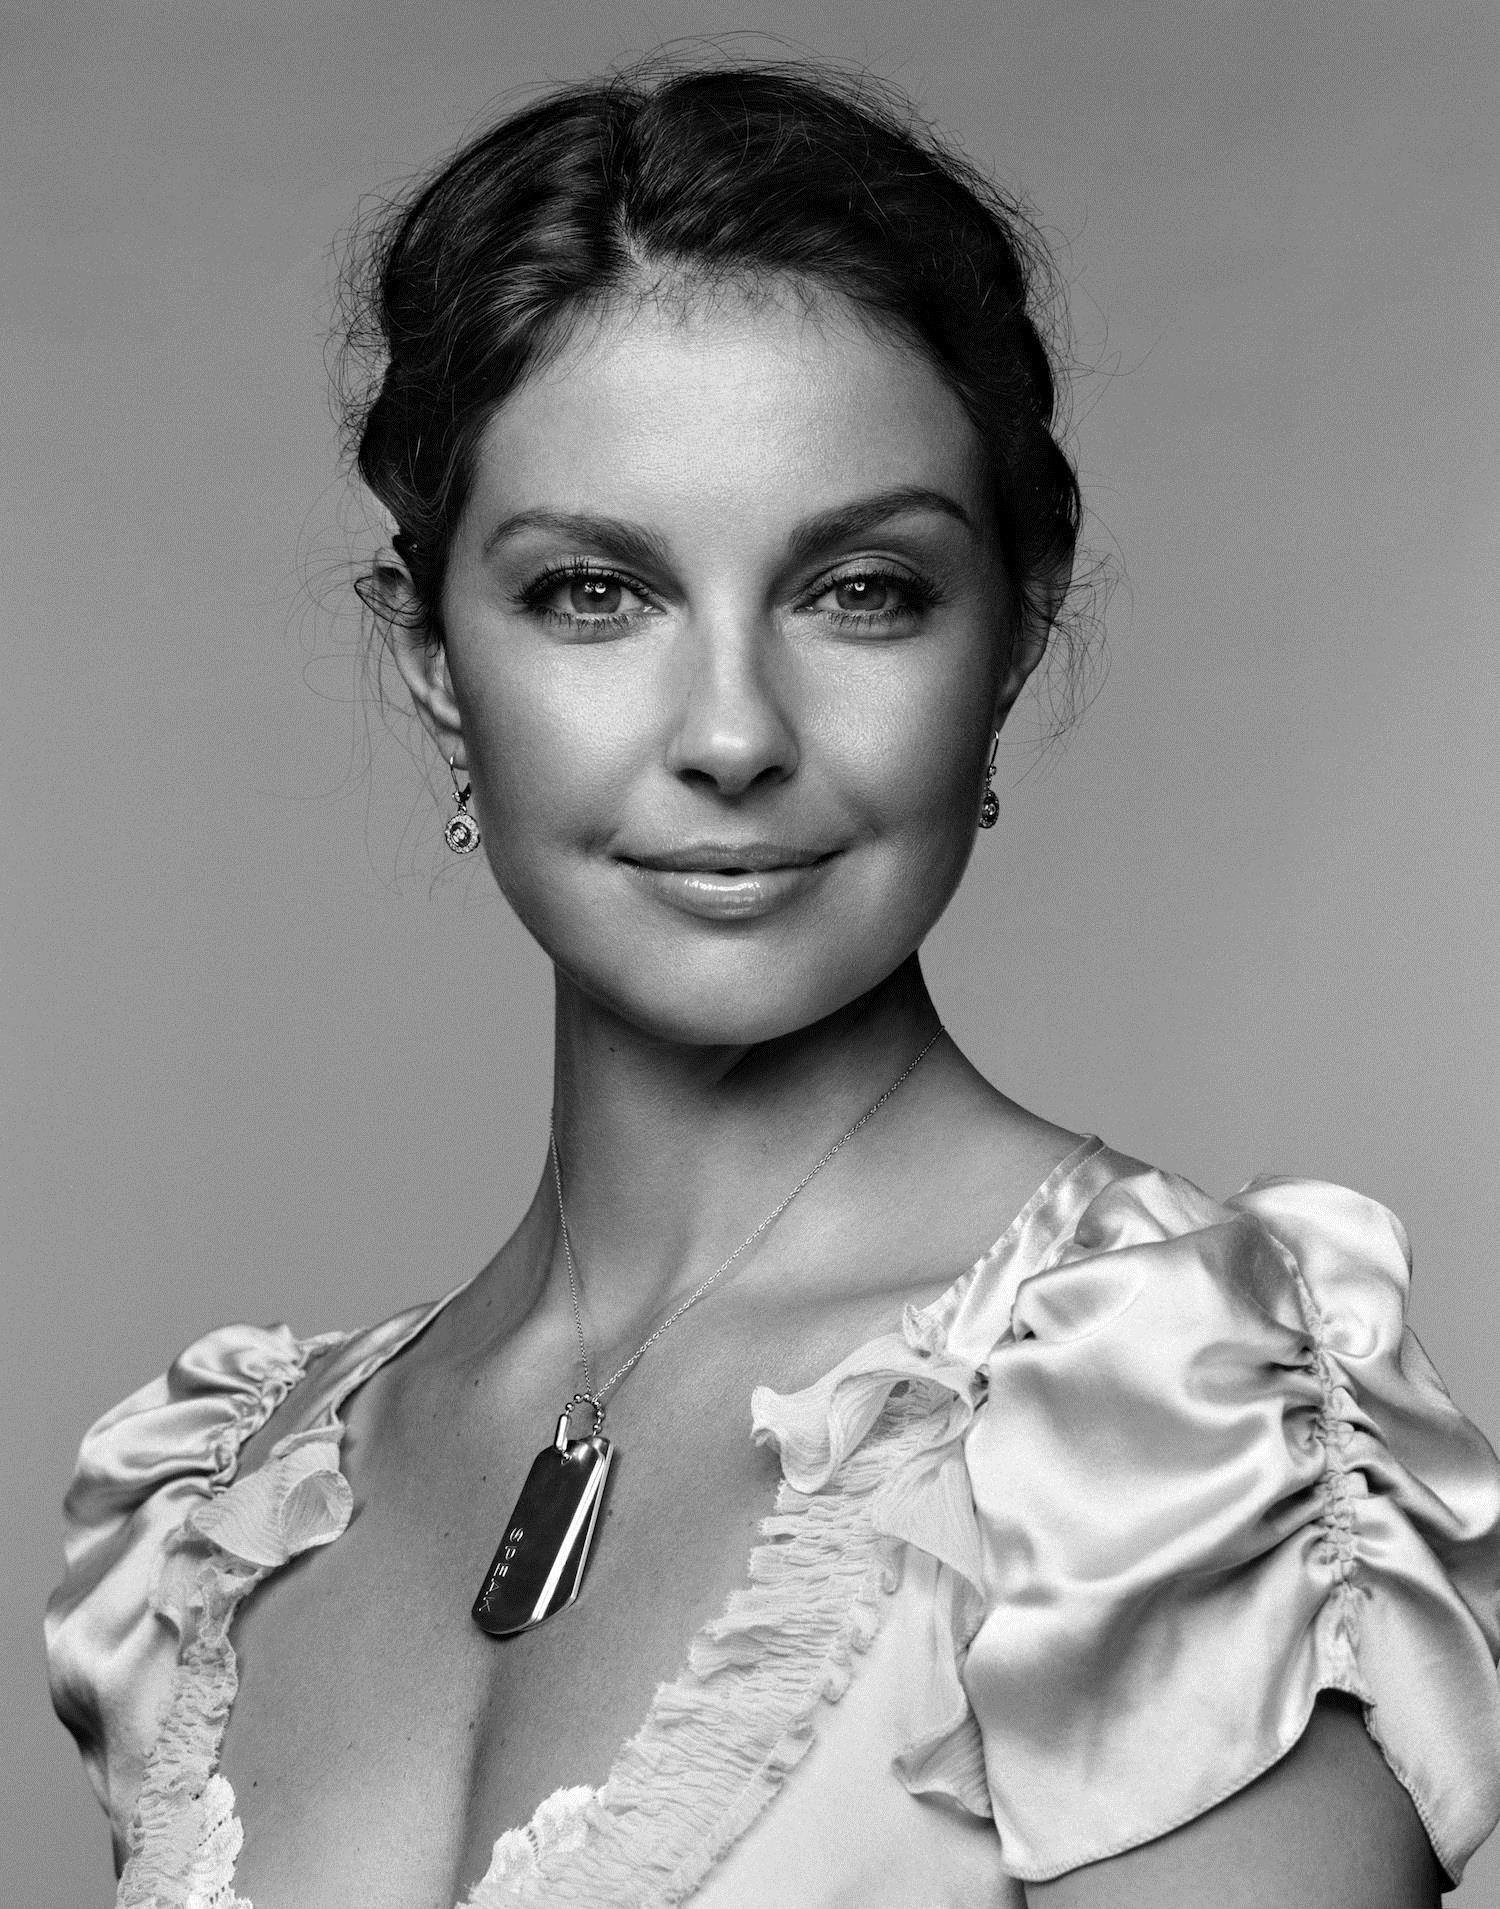 Ashley Judd (Source: Women's Media Center)